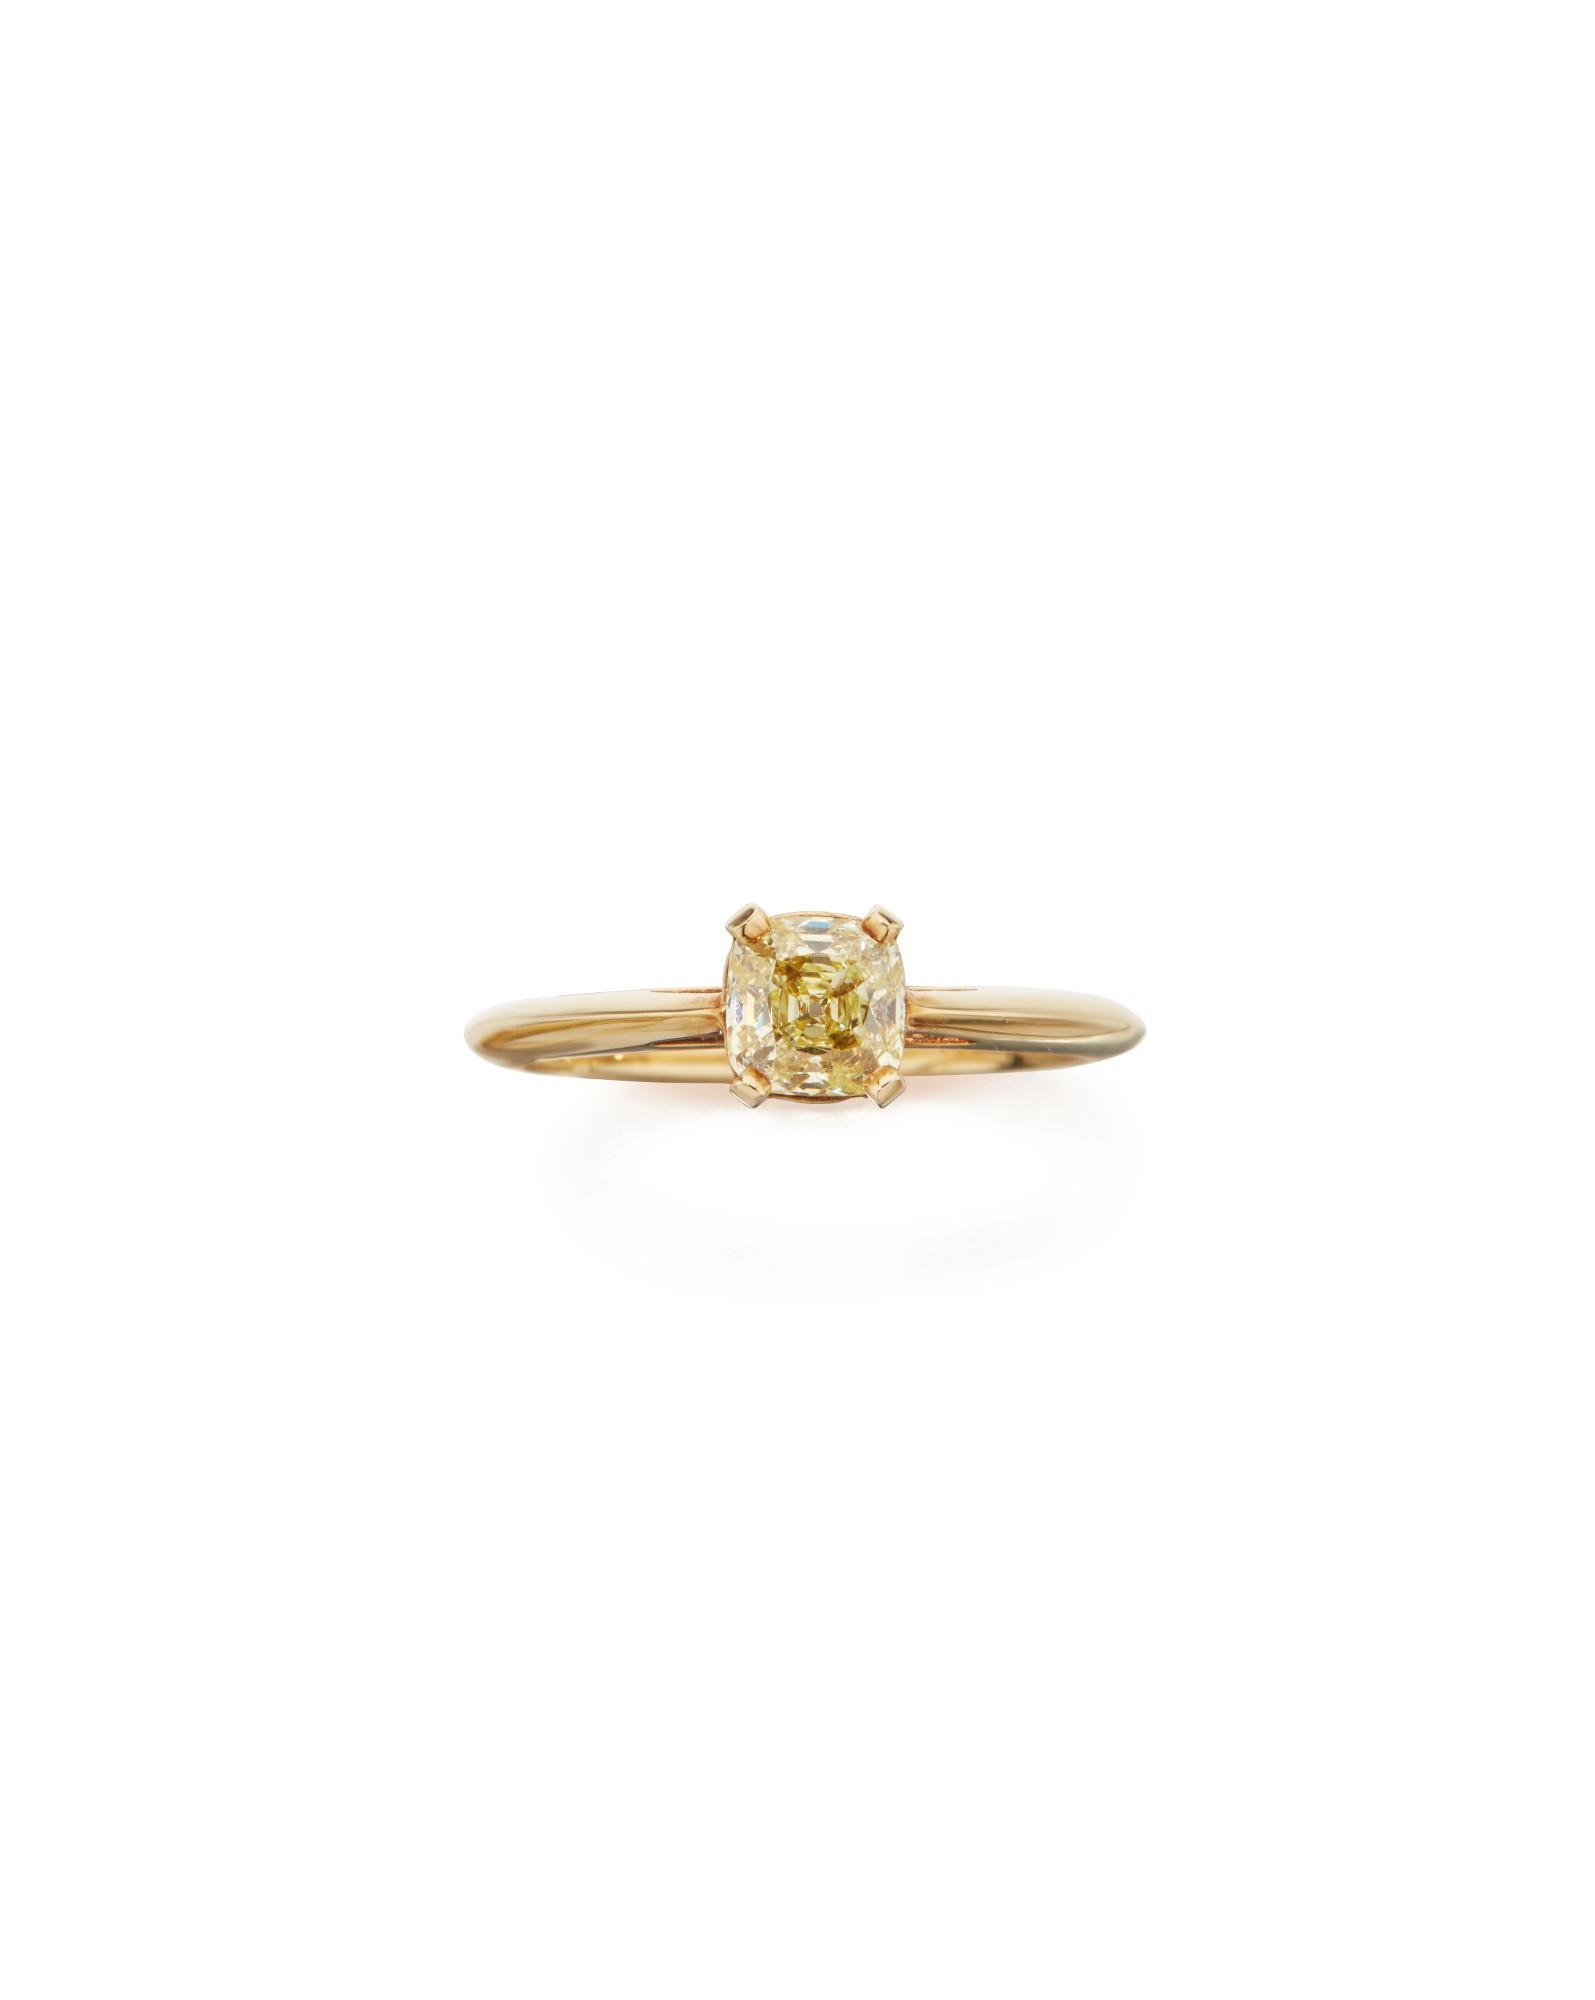 COLORED DIAMOND RING, TIFFANY & CO.